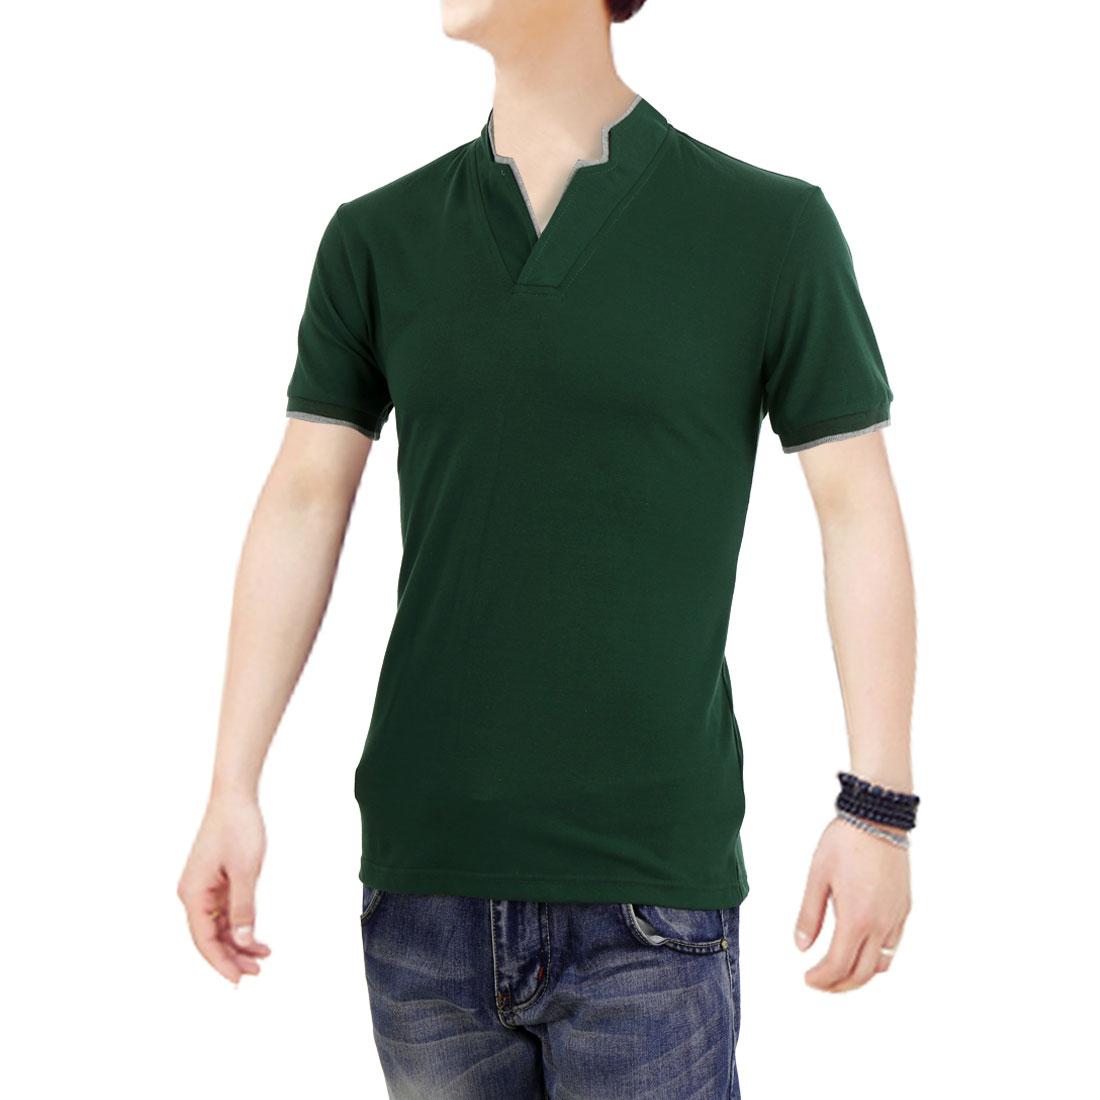 Men Modern Panel Stretchy Short-sleeved Tops Shirts Dark Green M